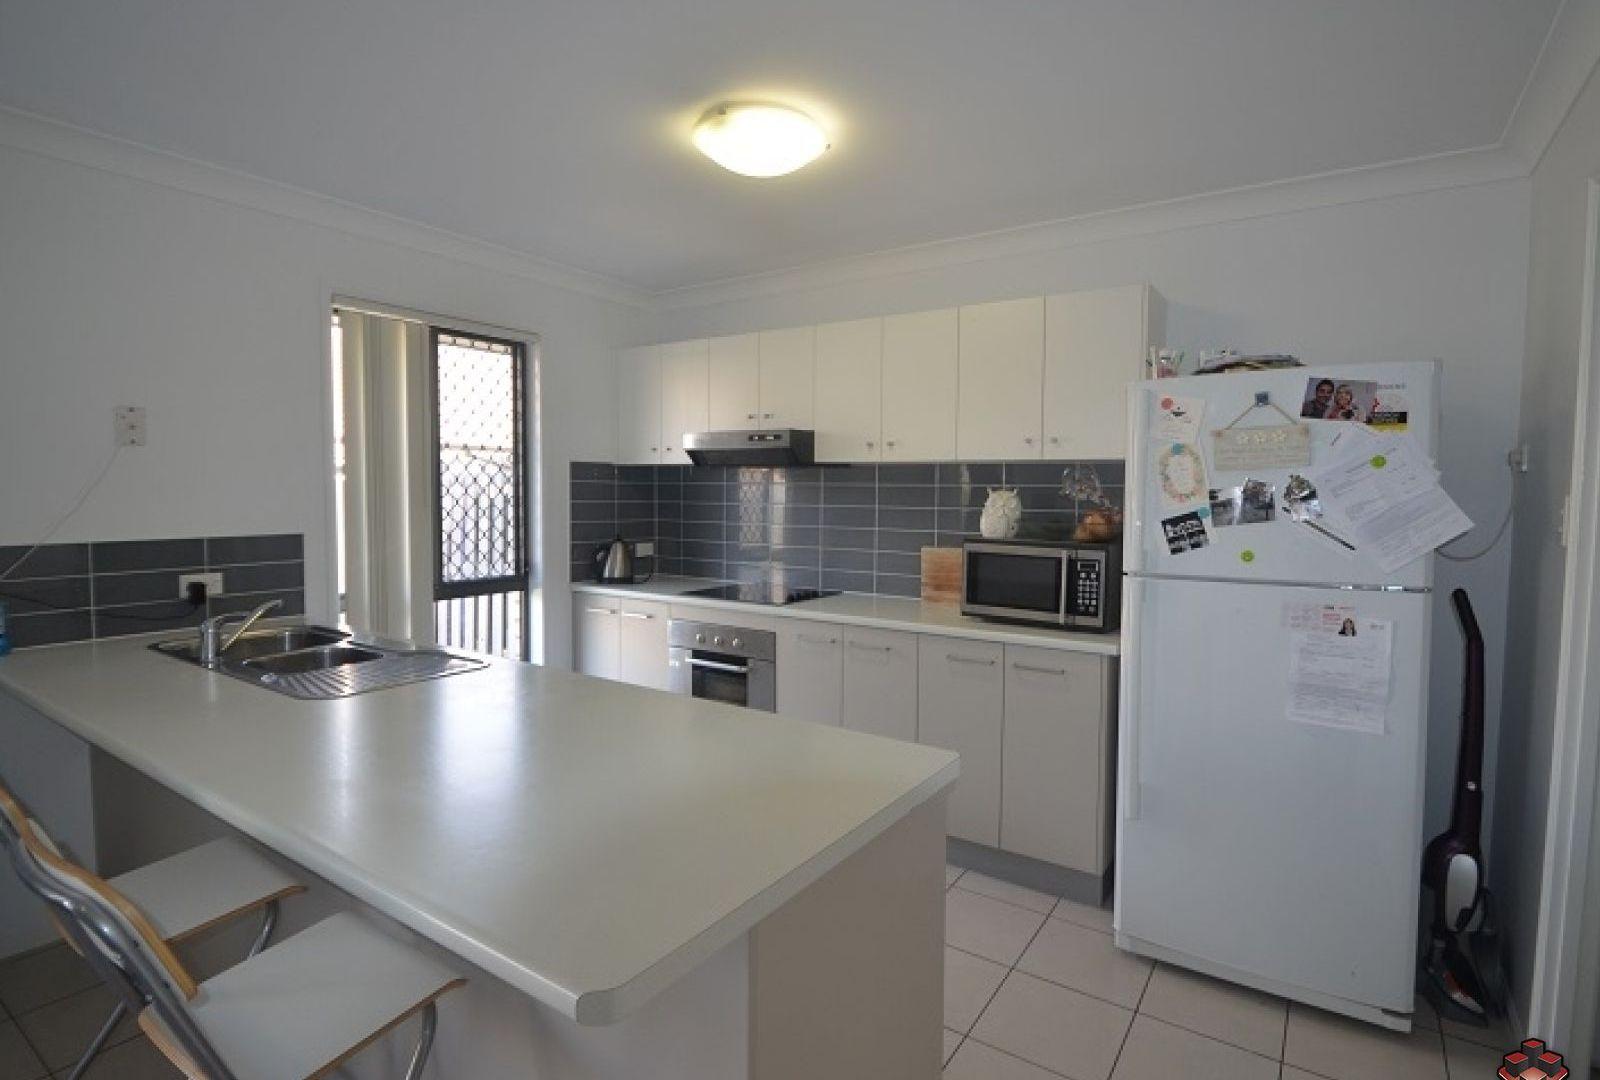 17/22 Gawler Crescent, Bracken Ridge QLD 4017, Image 1